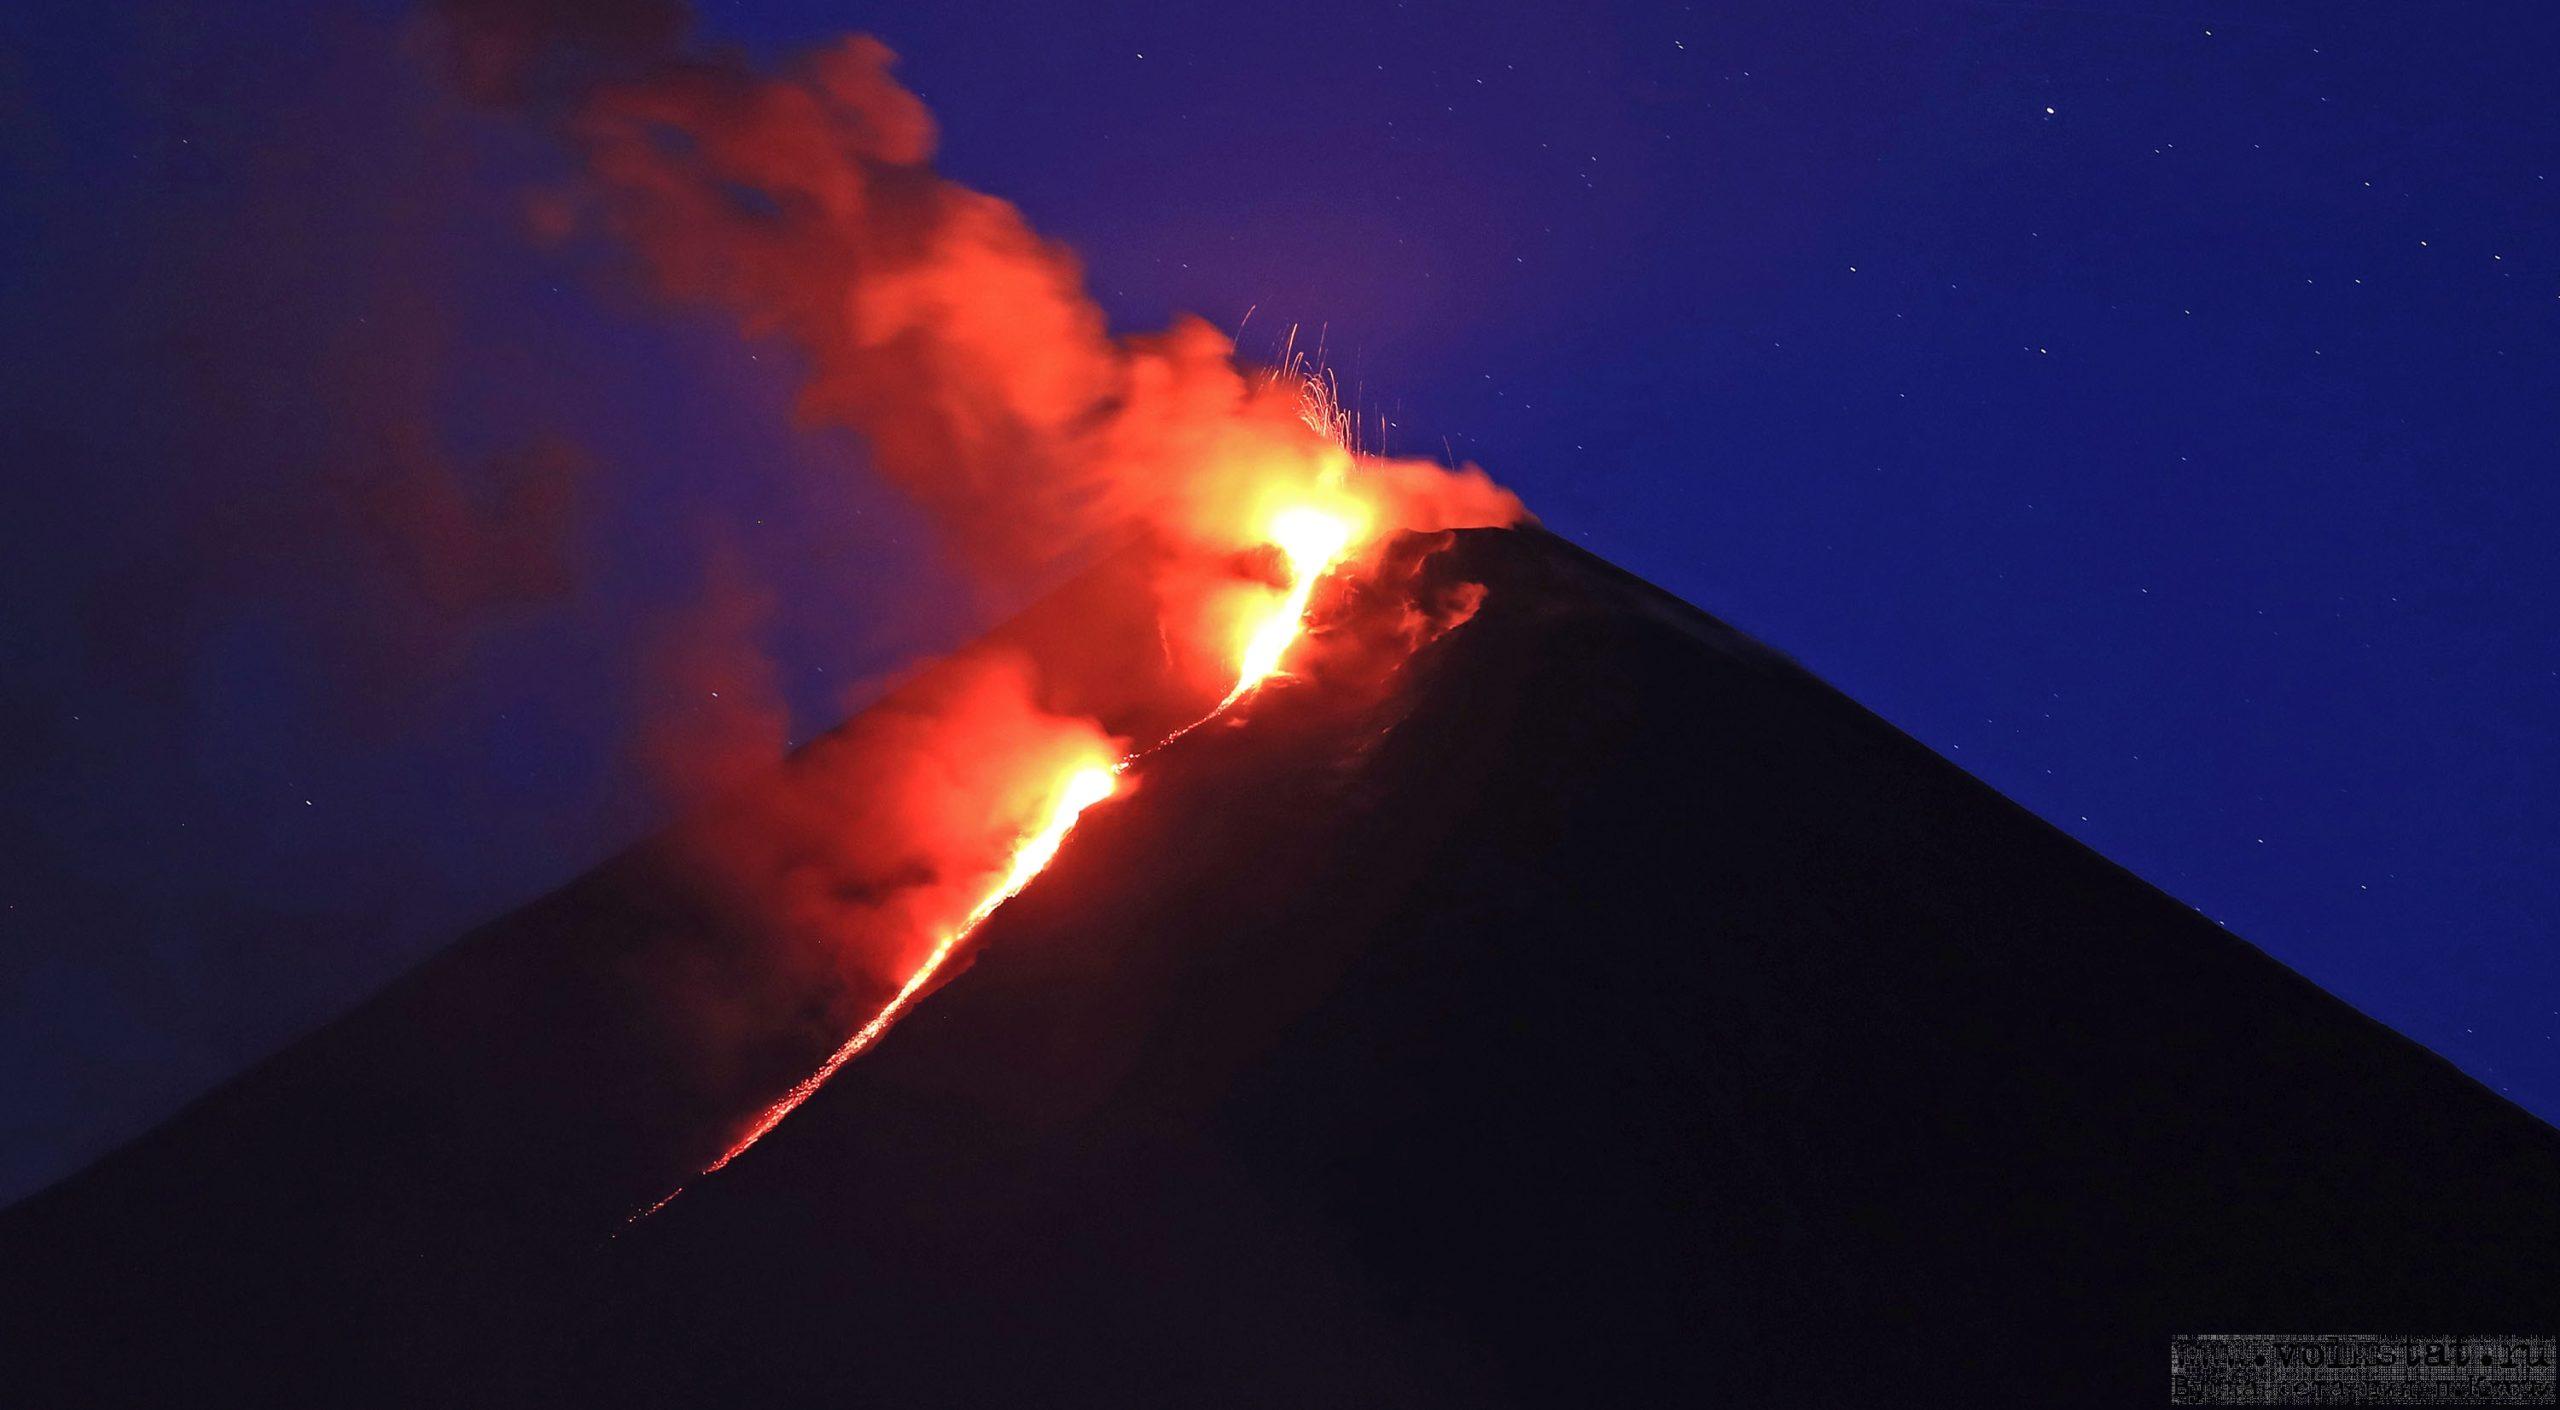 April 27, 2020. EN. Italy : Campi Flegrei , Kamchatka : Klyuchevskoy , Indonesia : Anak Krakatau , Costa Rica : Rincon de la Vieja , Alaska : Cleveland .